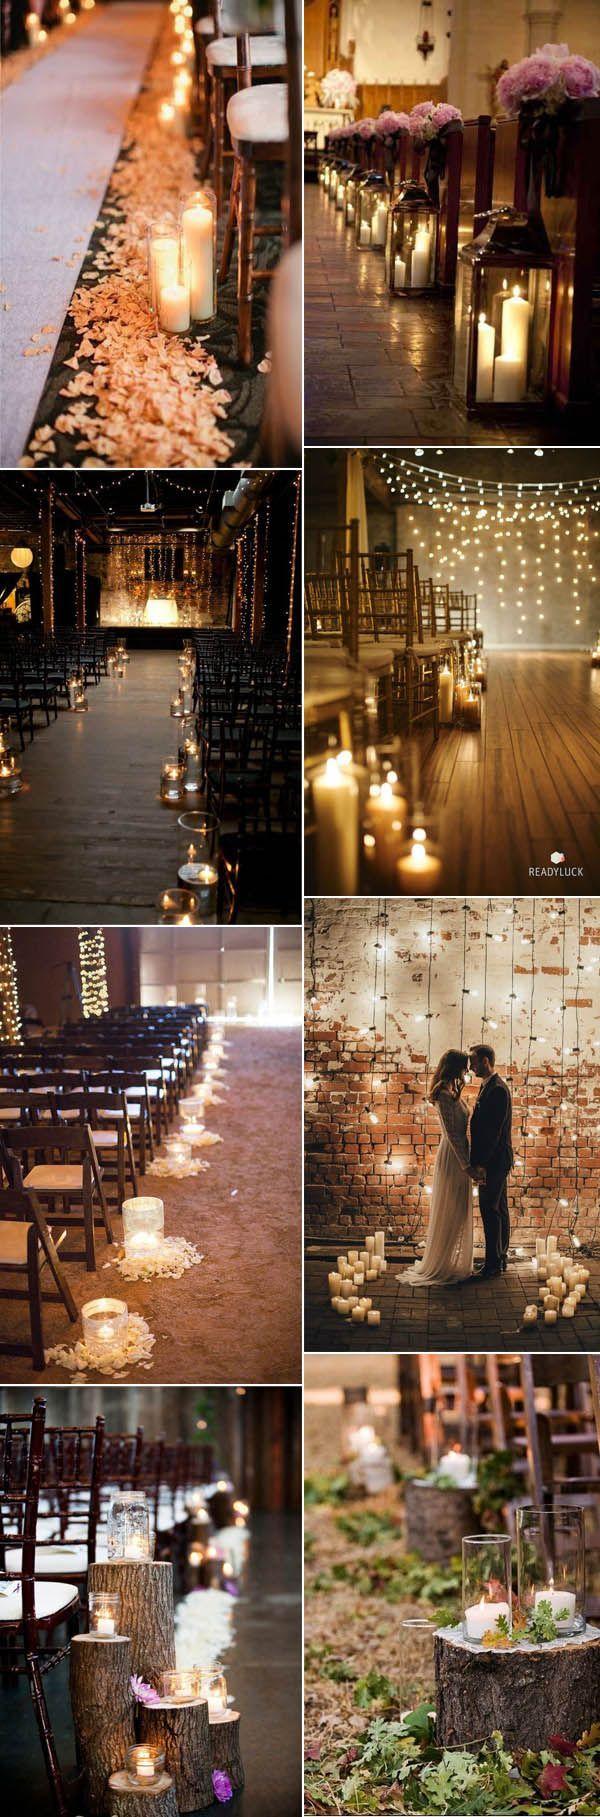 Best 25 Candlelight Wedding Ideas On Pinterest